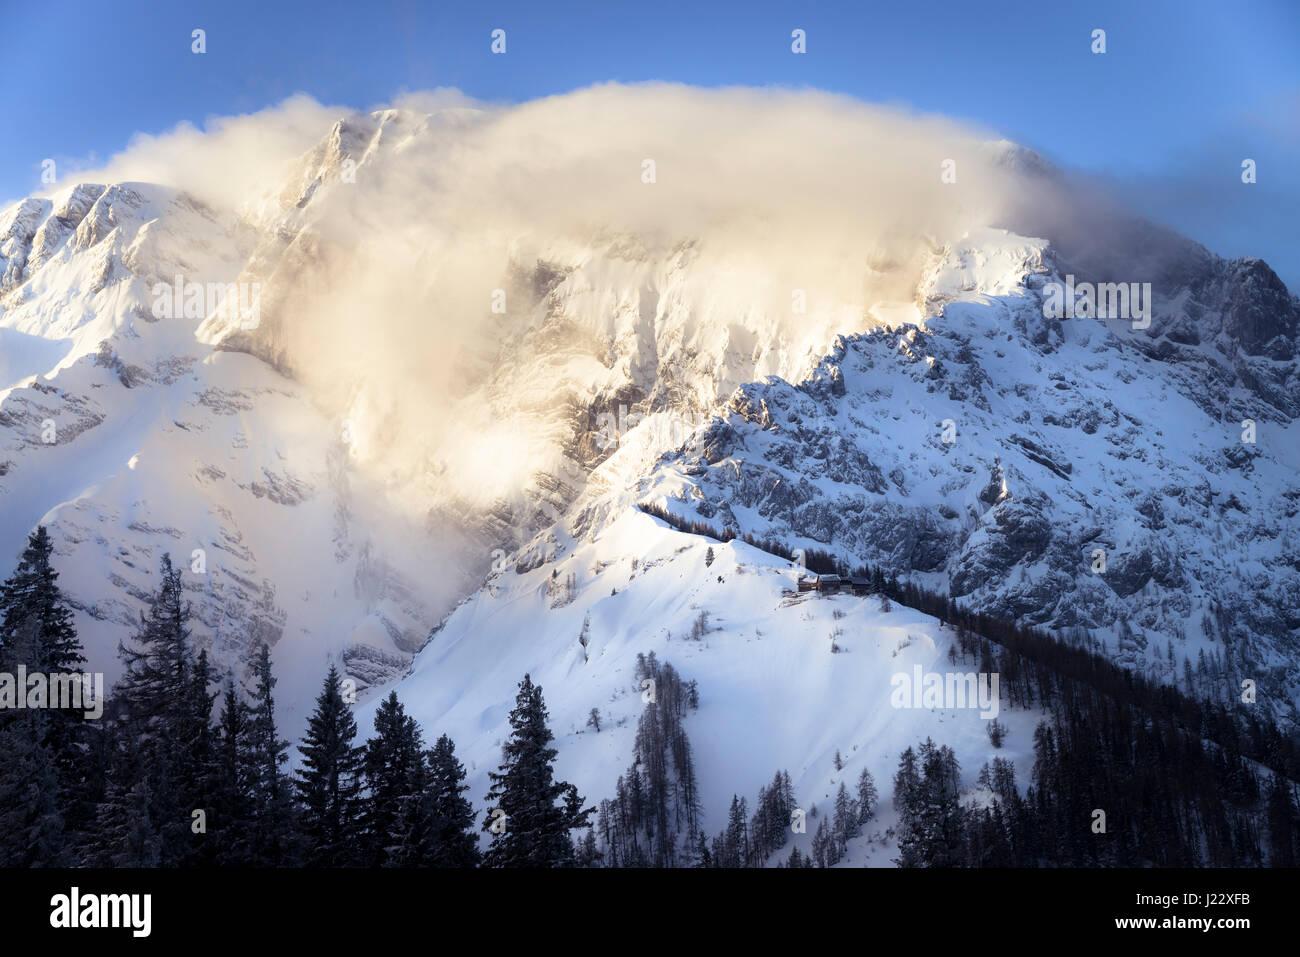 Germany, Bavaria, Berchtesgaden, Purtschellerhaus on Hoher Goell at sunrise Stock Photo